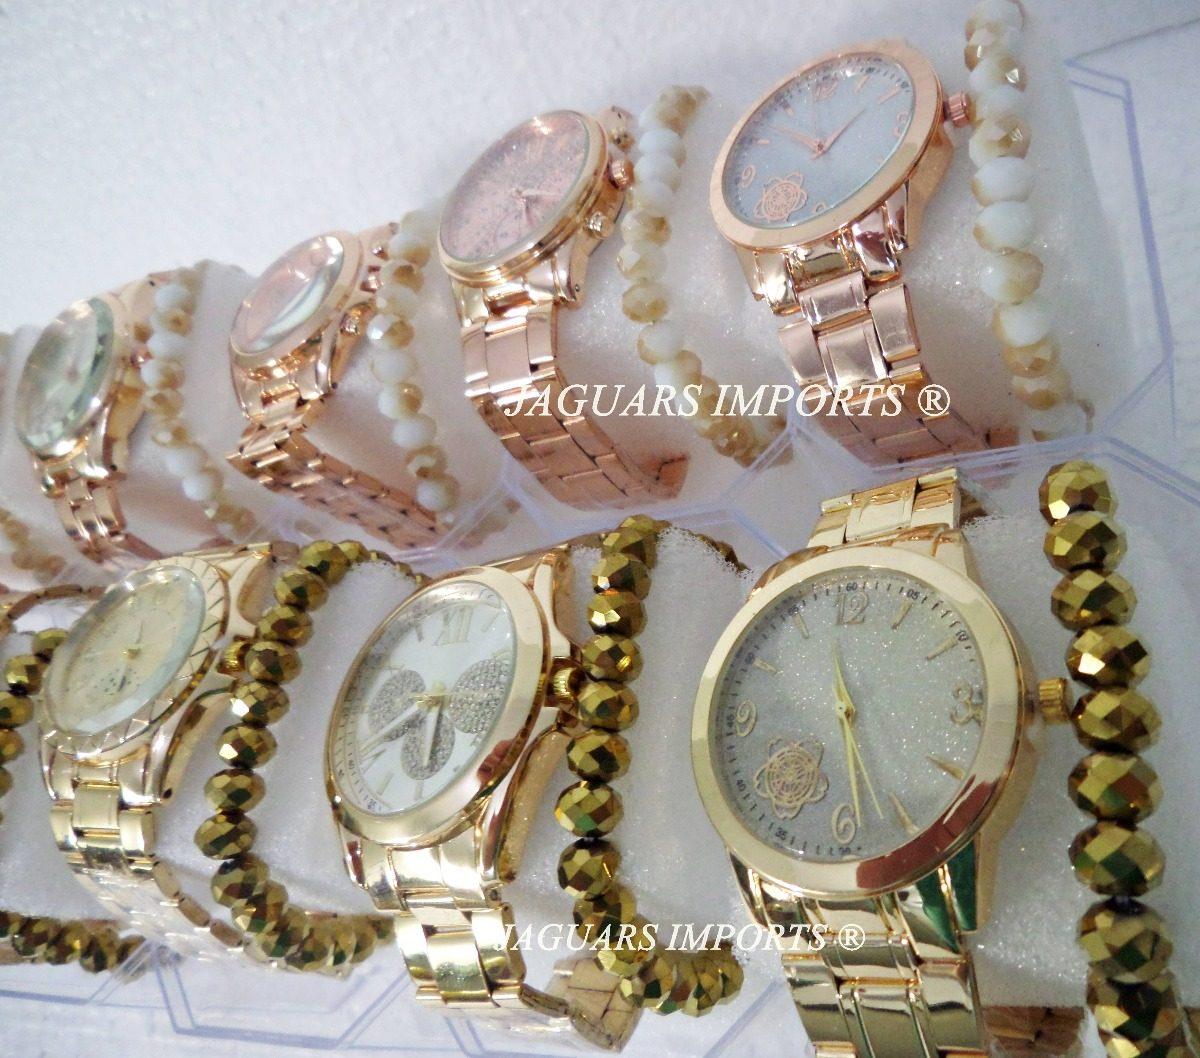 f54395891be 3 kit 5 relógios femininos c pulseira + caixa barato revenda. Carregando  zoom.